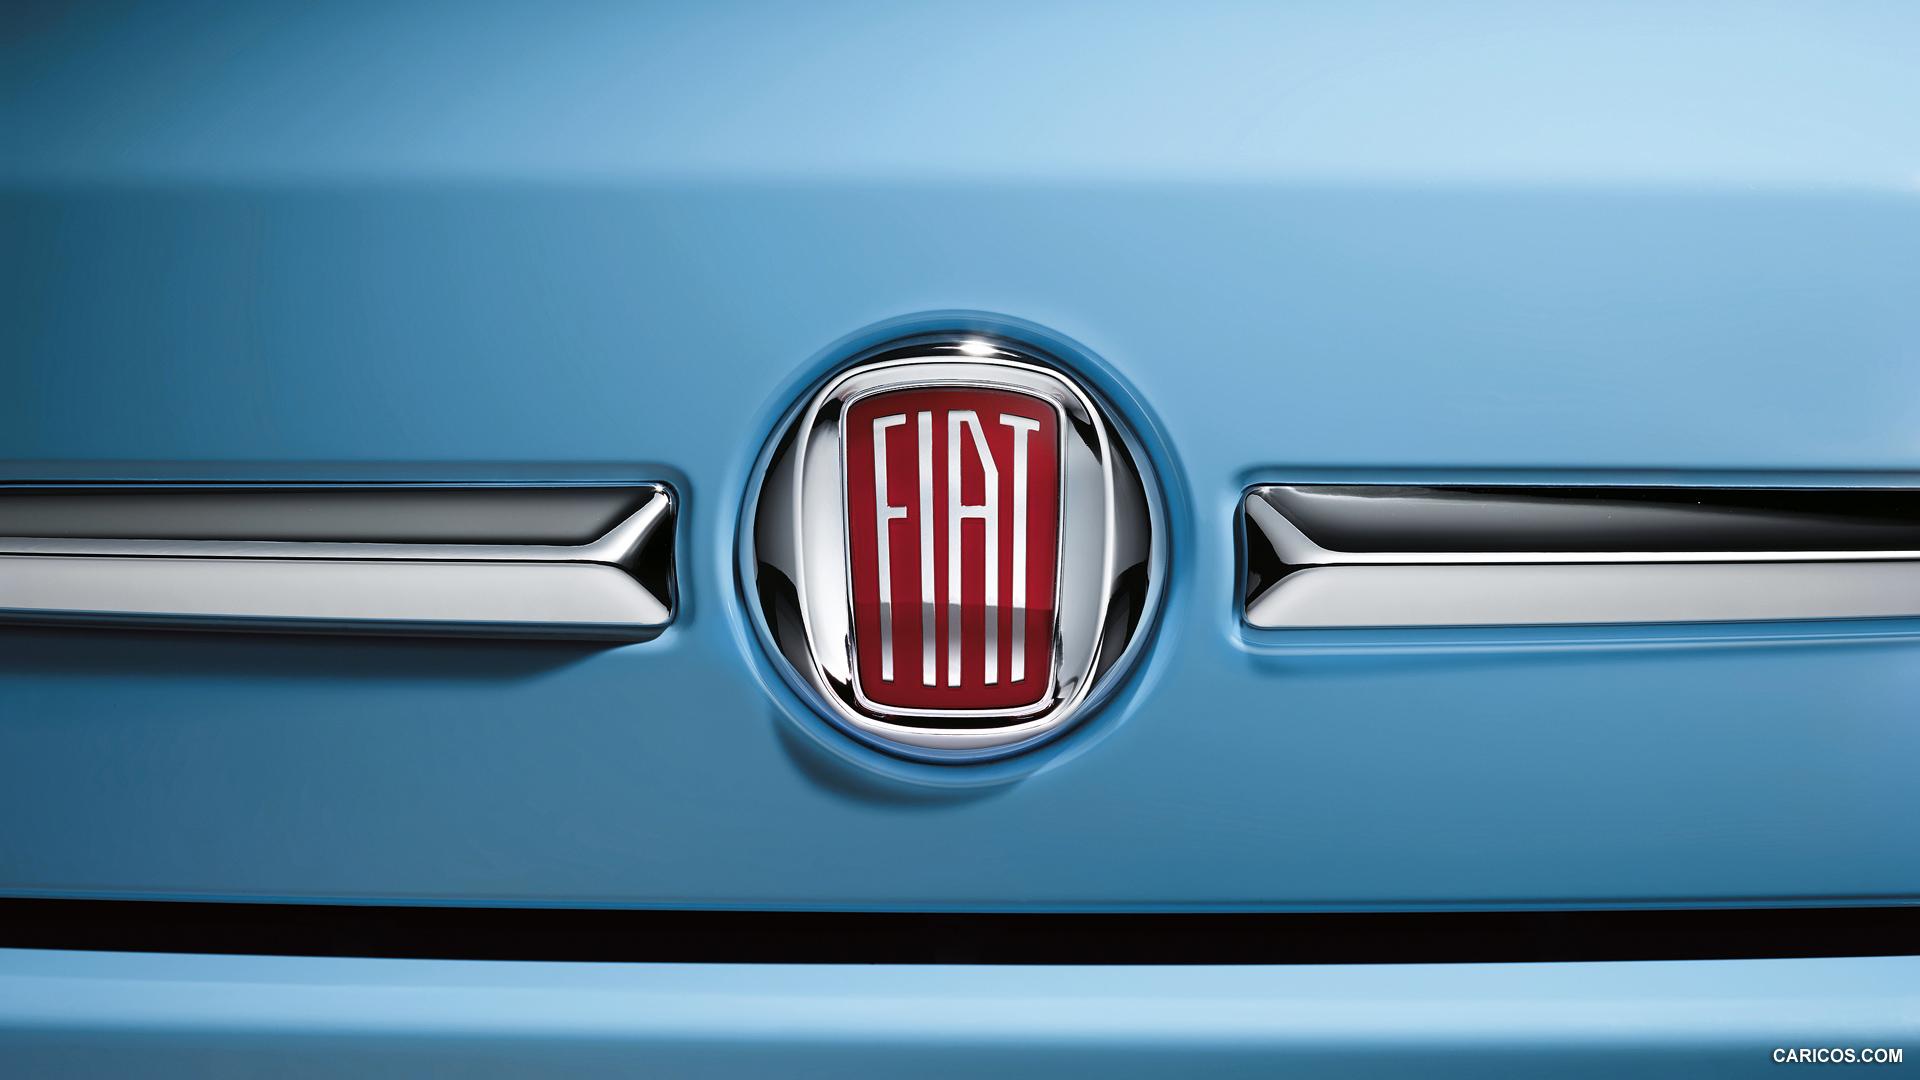 2015 Fiat 500 Vintage 57   Badge HD Wallpaper 17 1920x1080